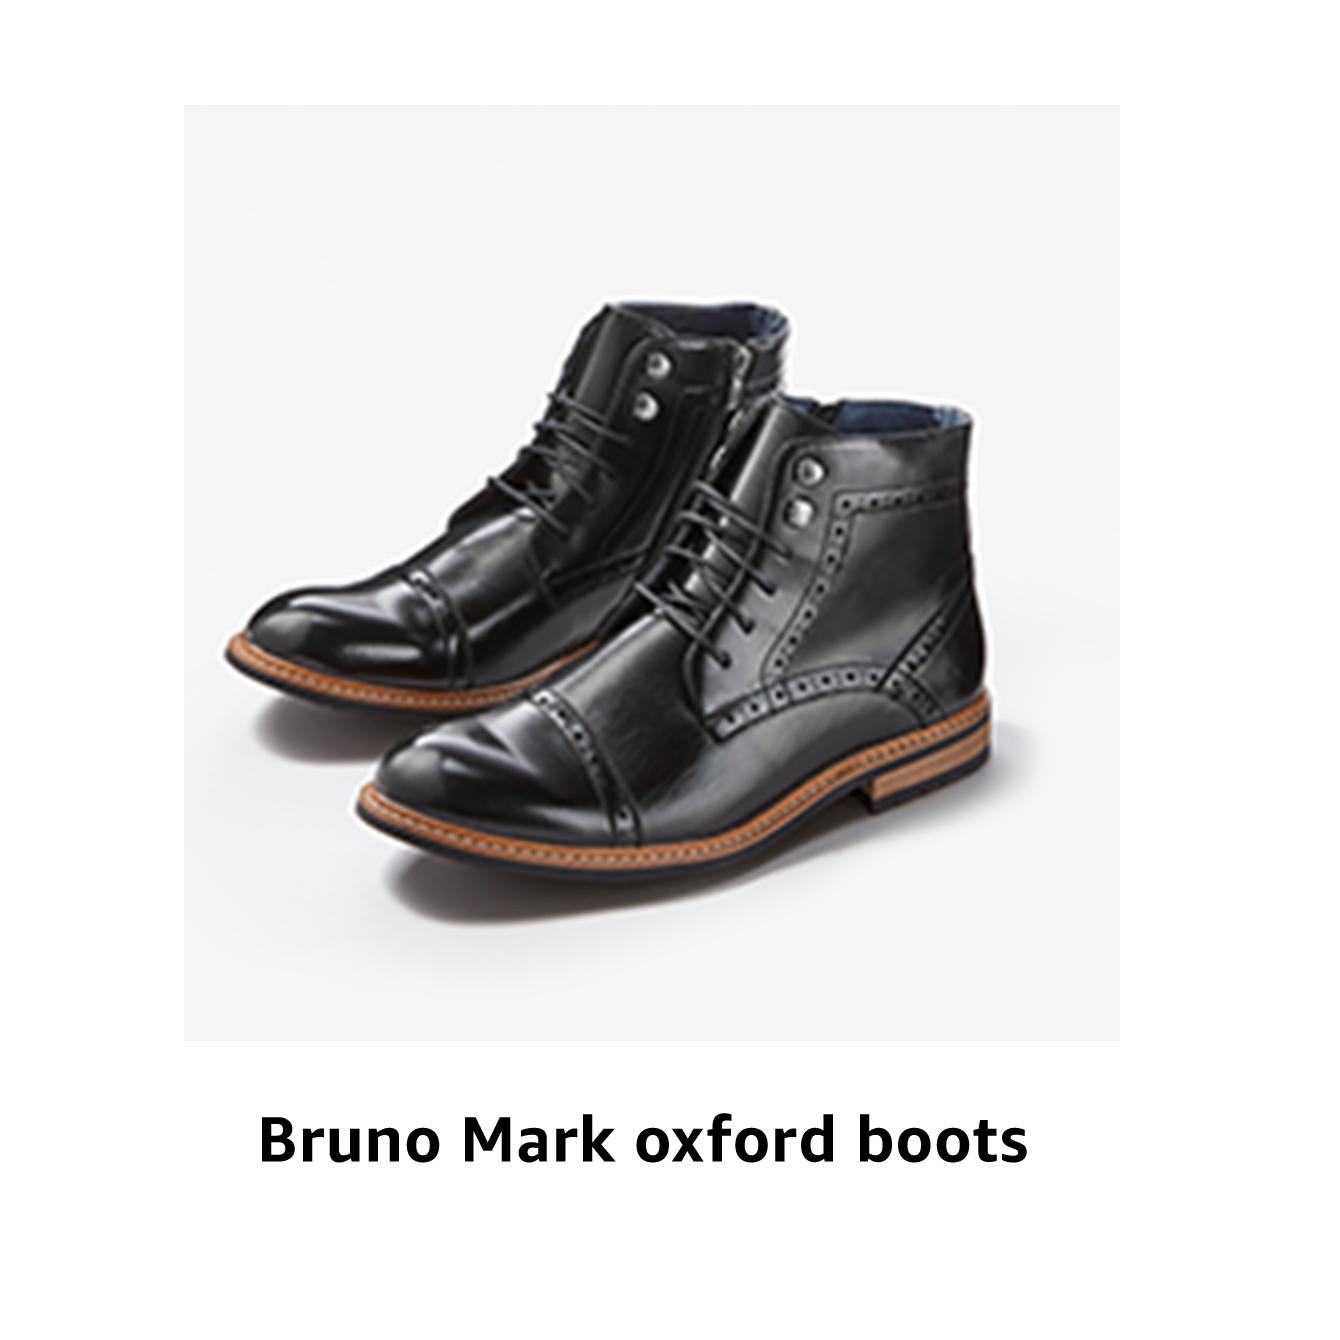 Bruno Mark oxford boots